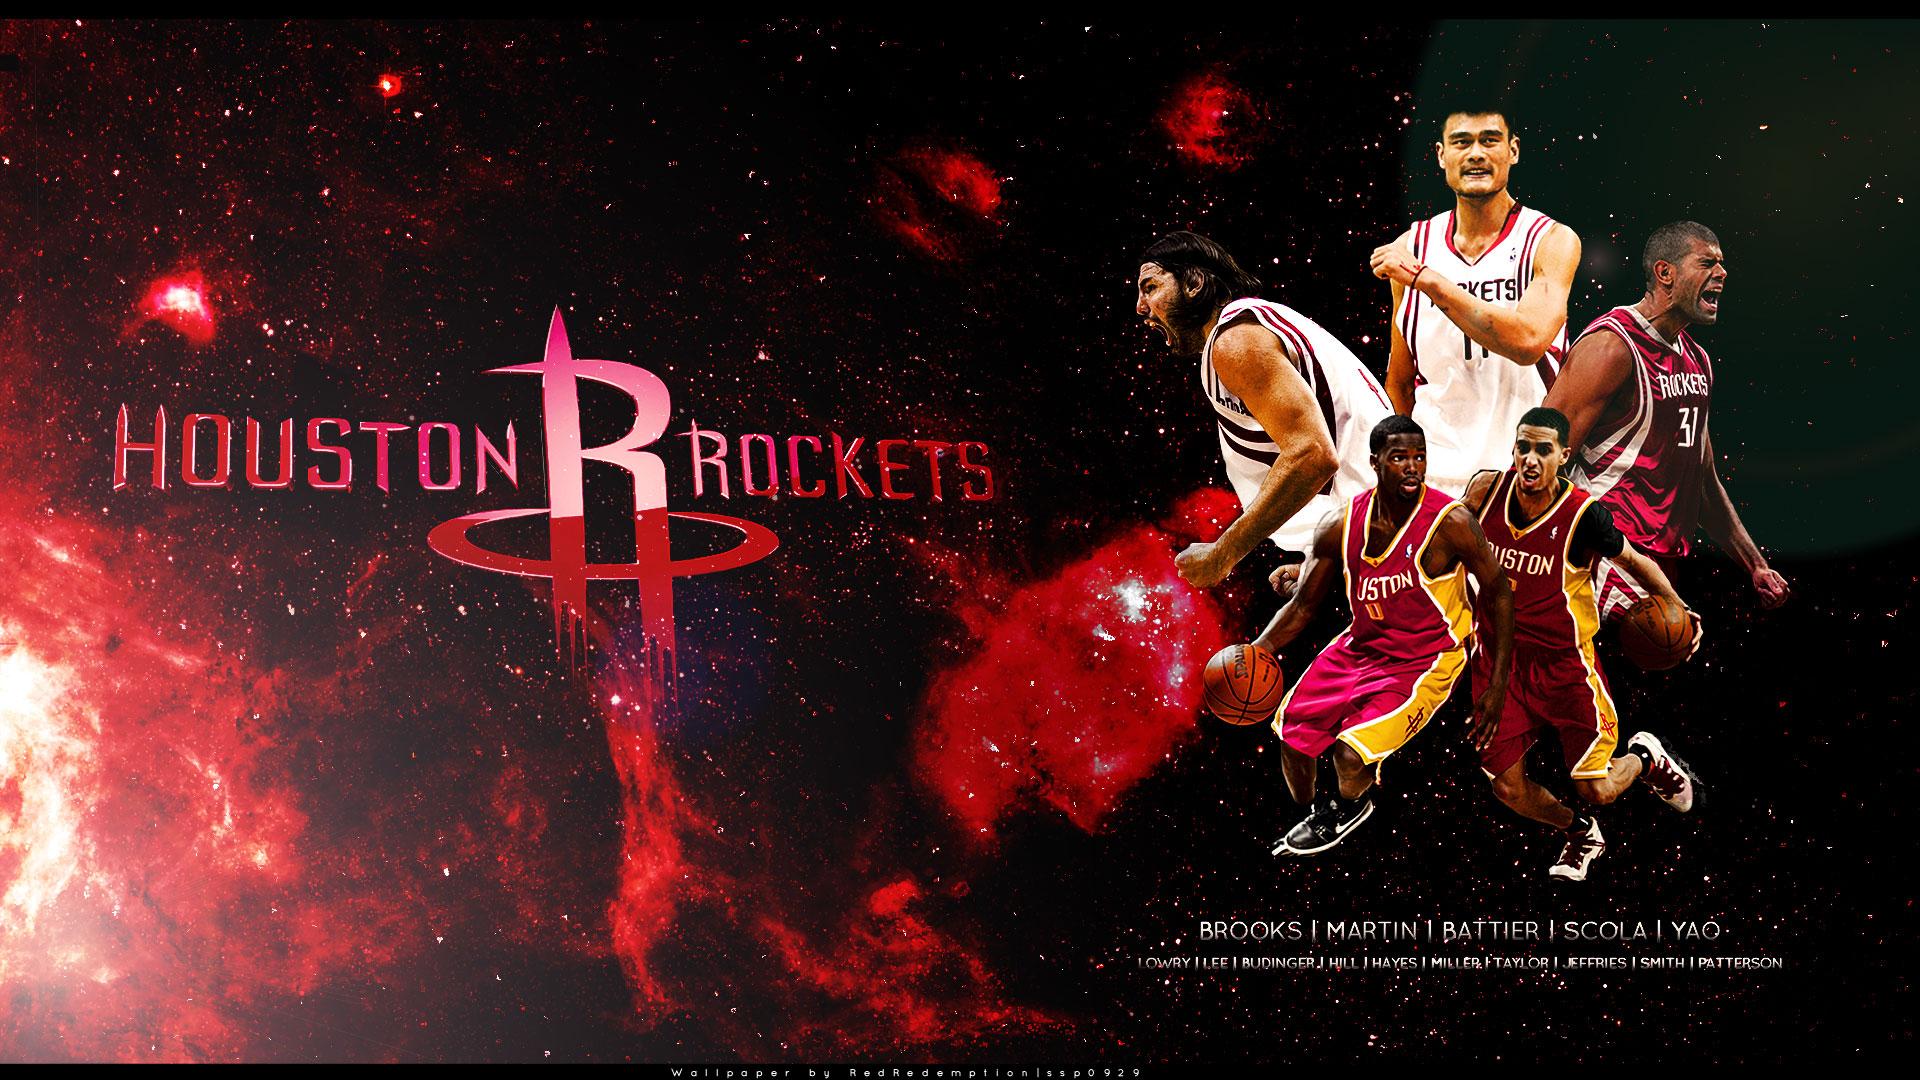 Houston Rockets Wallpapers HD - WallpaperSafari